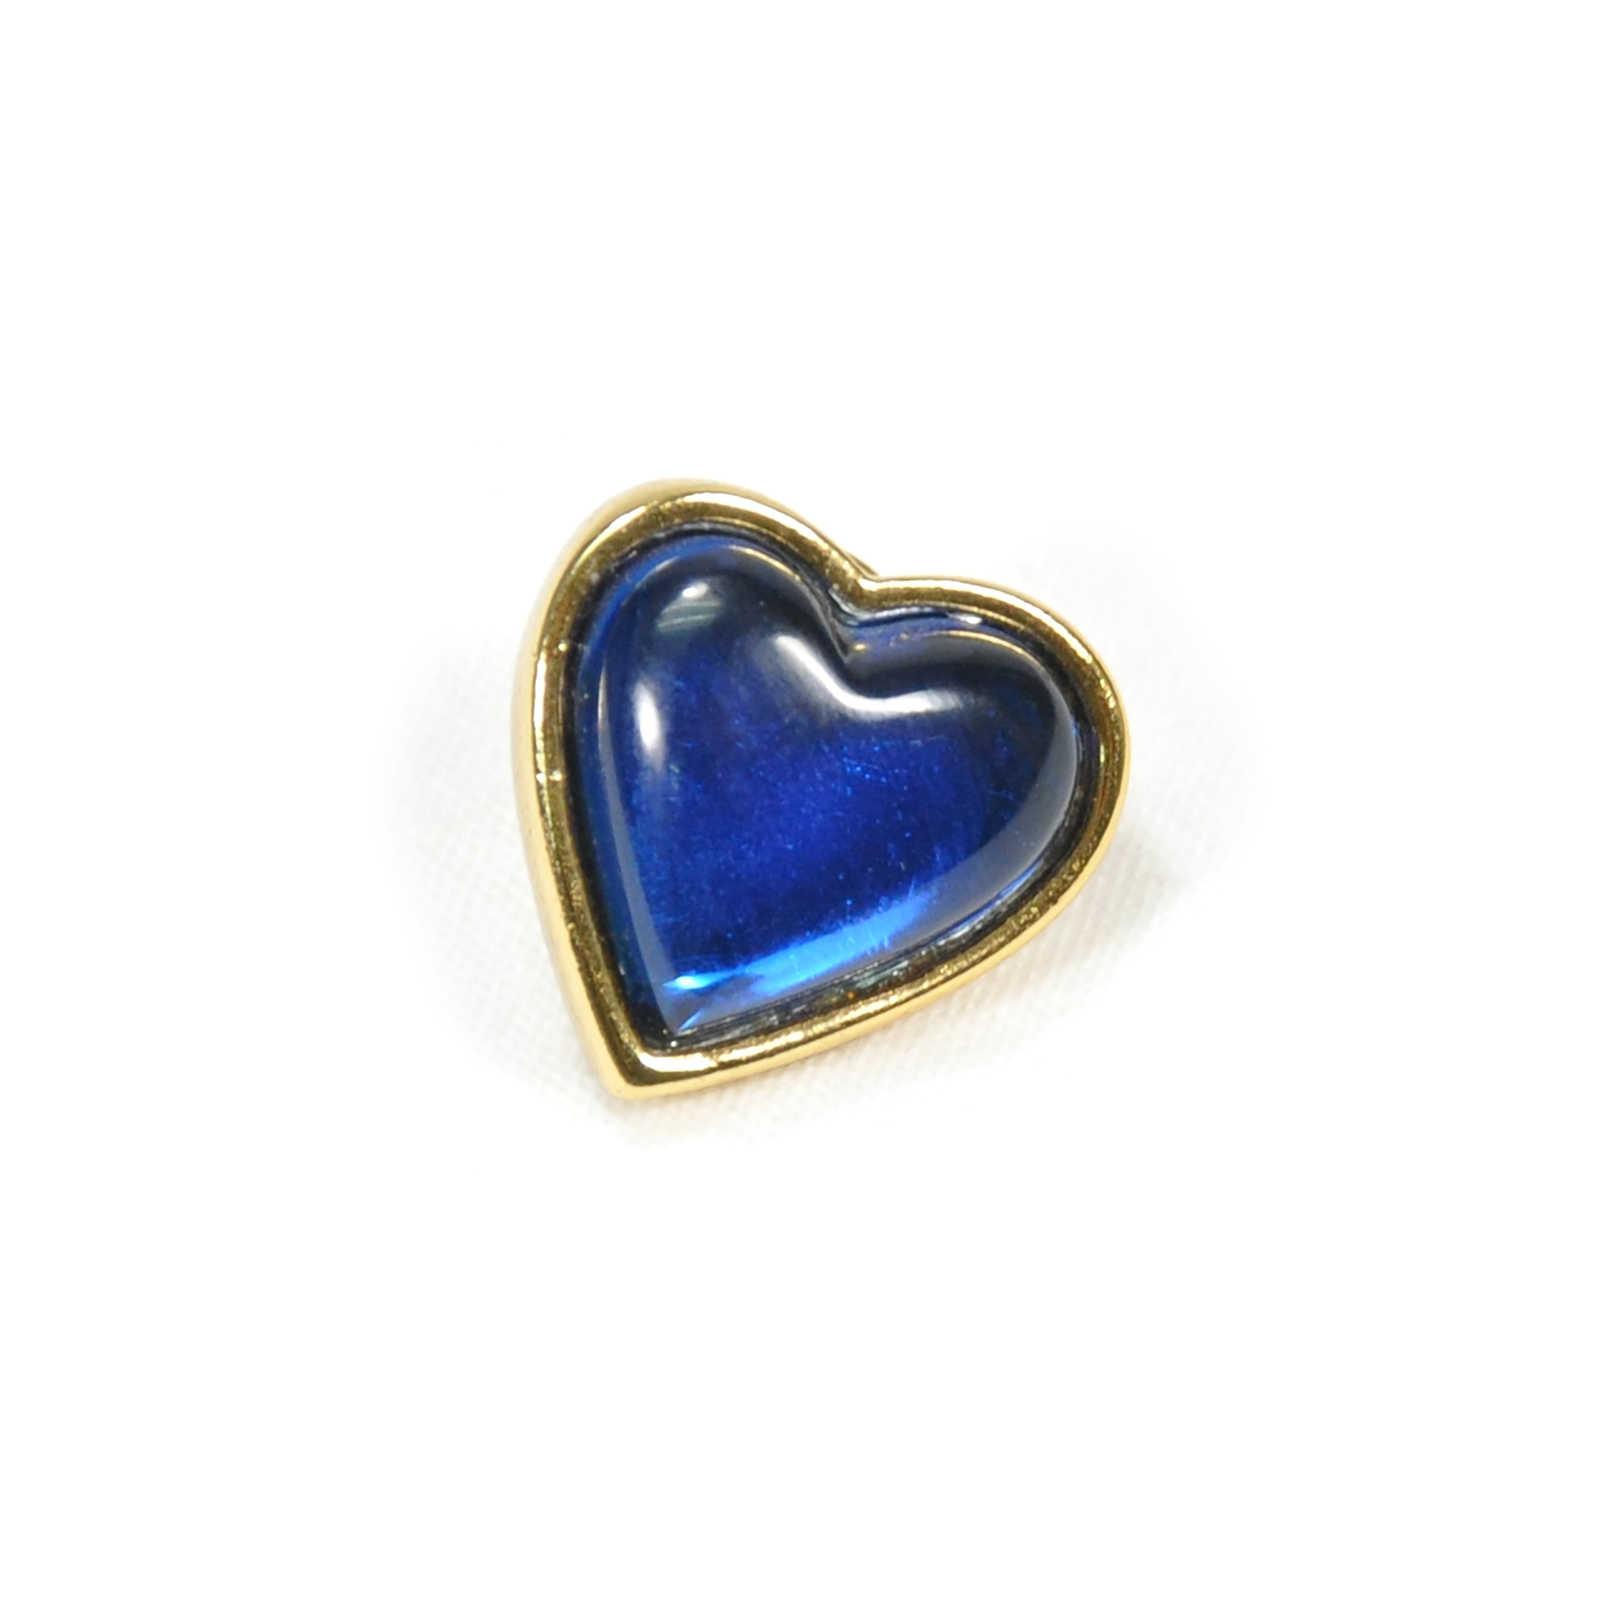 YVES SAINT LAURENT - Glass Heart Brooch Blue